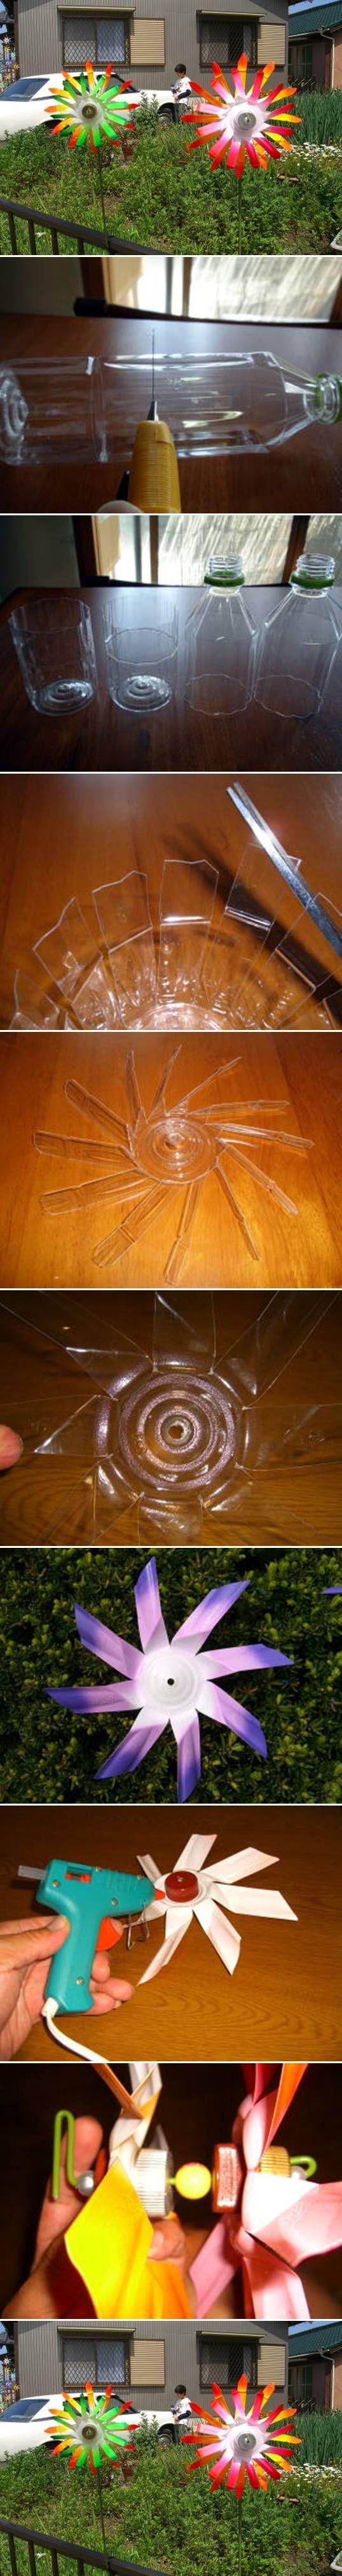 DIY Plastic Bottle Windmill